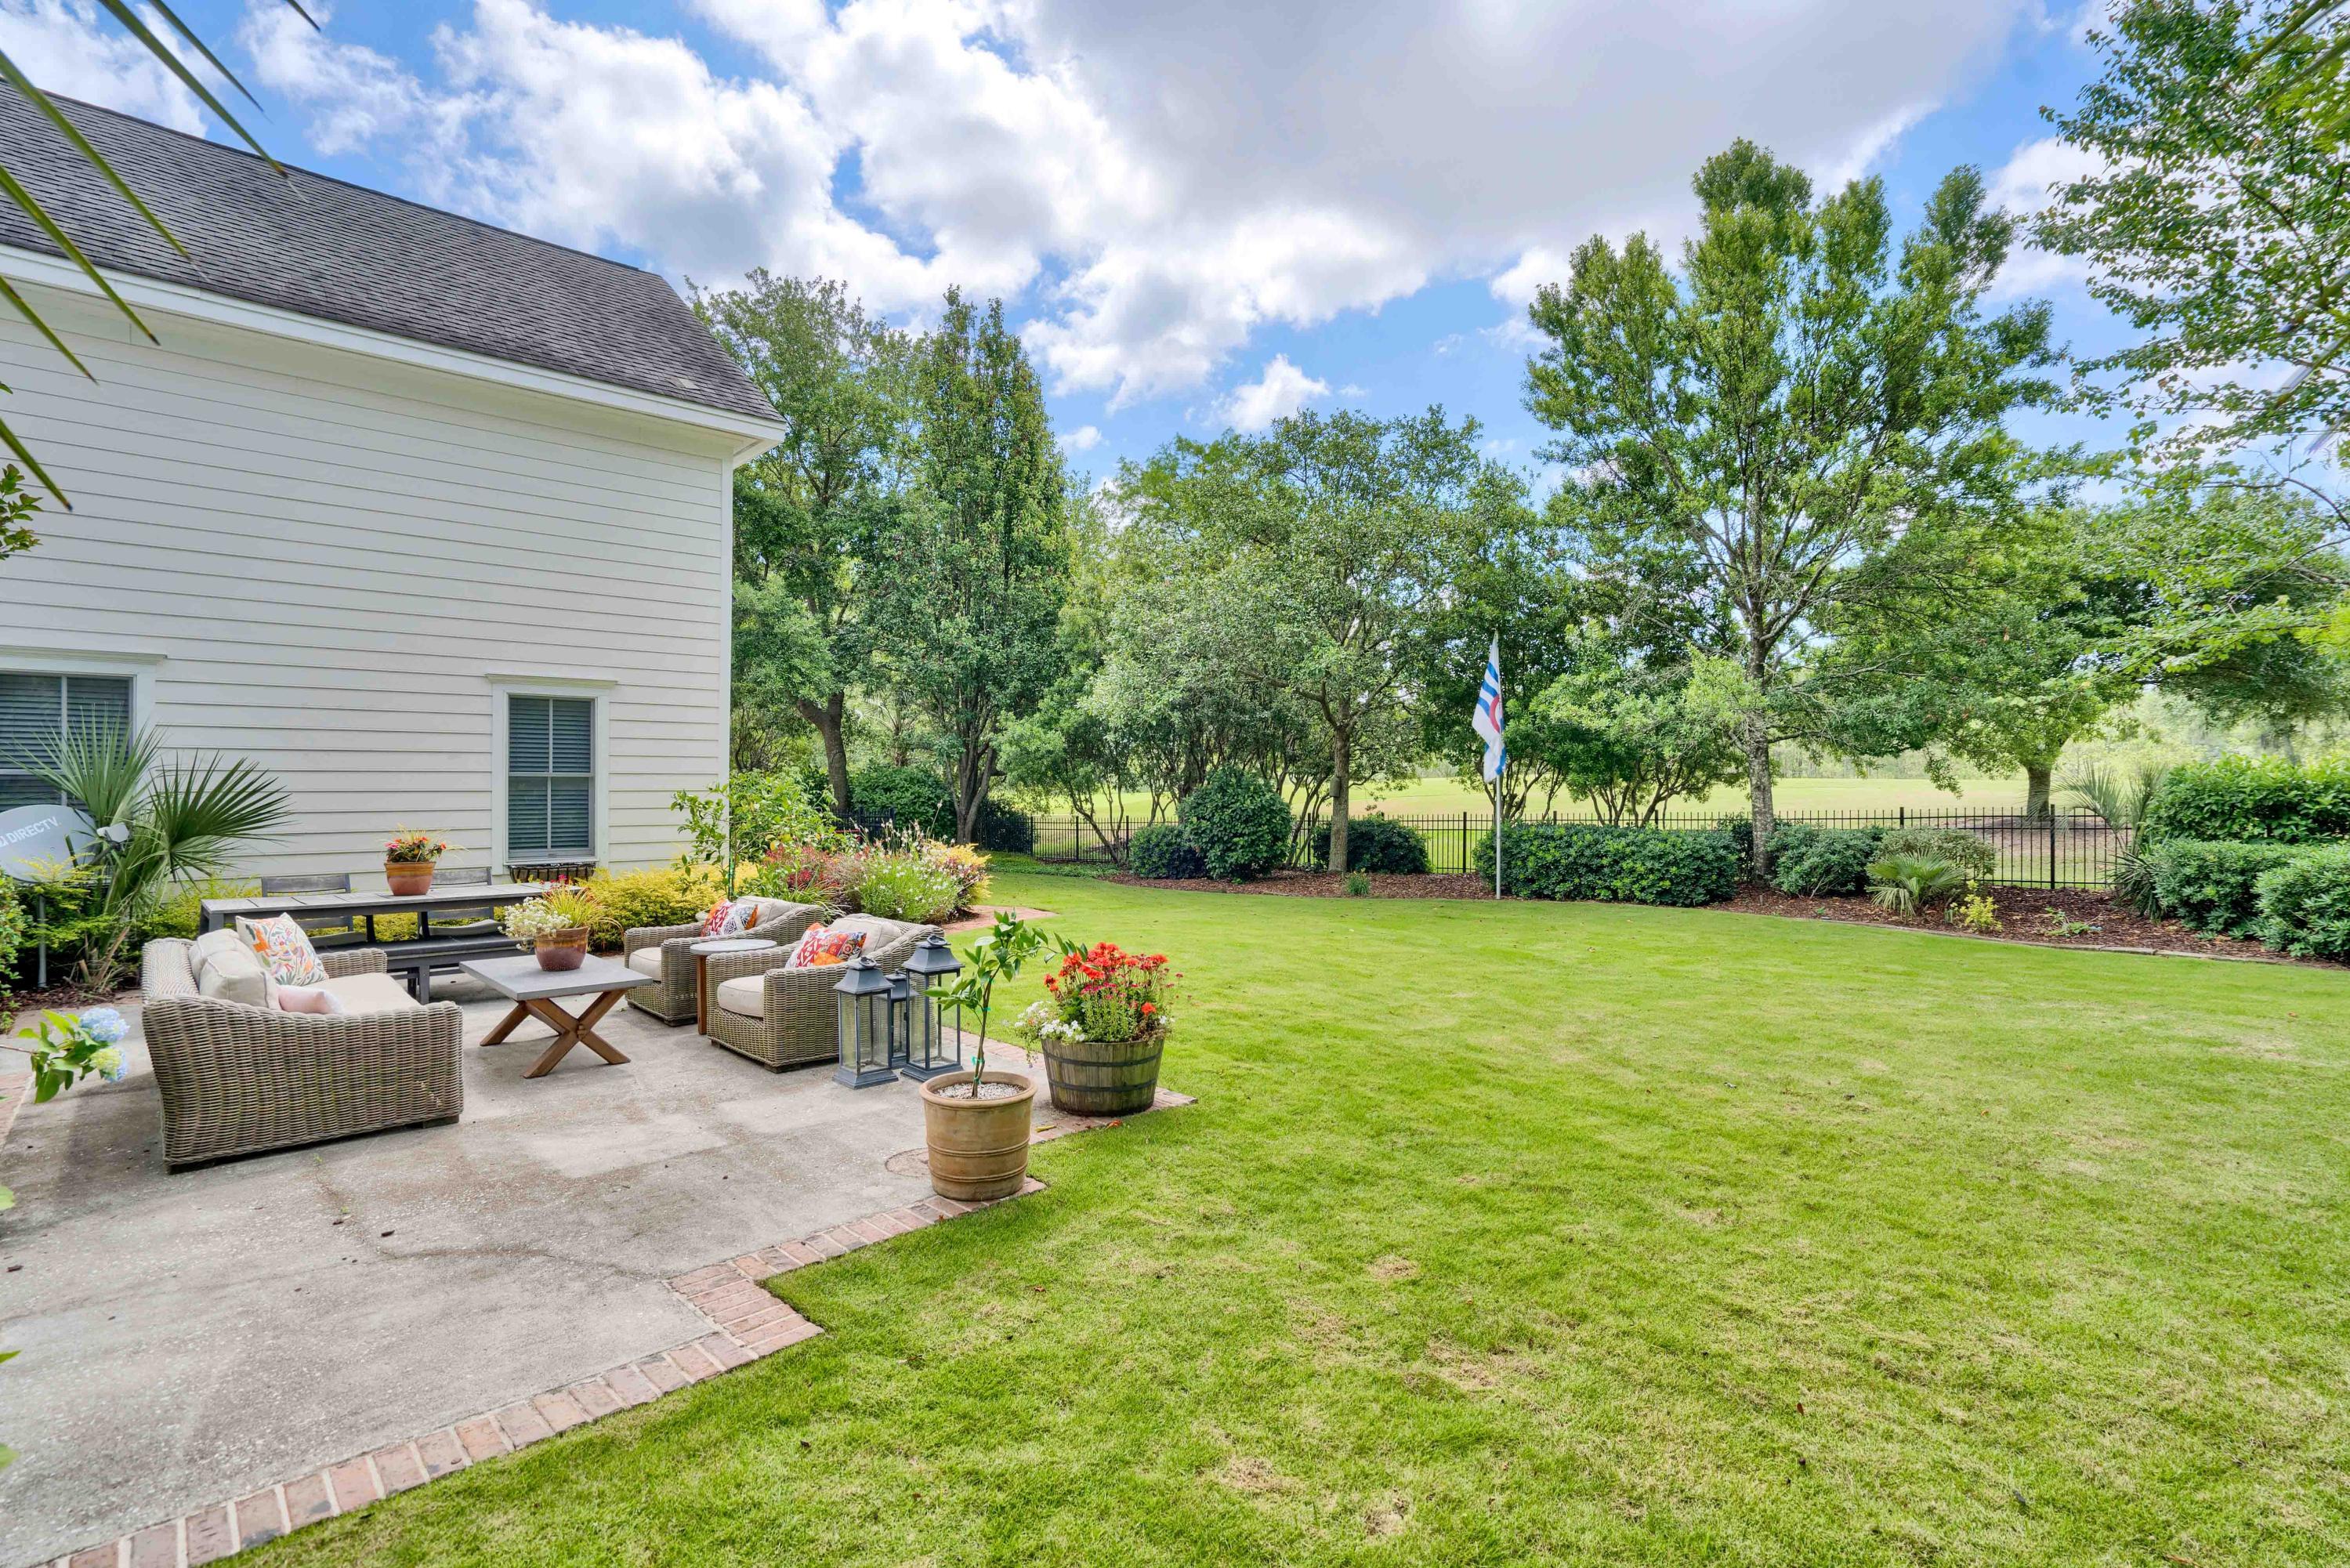 Daniel Island Homes For Sale - 43 Dalton, Charleston, SC - 3